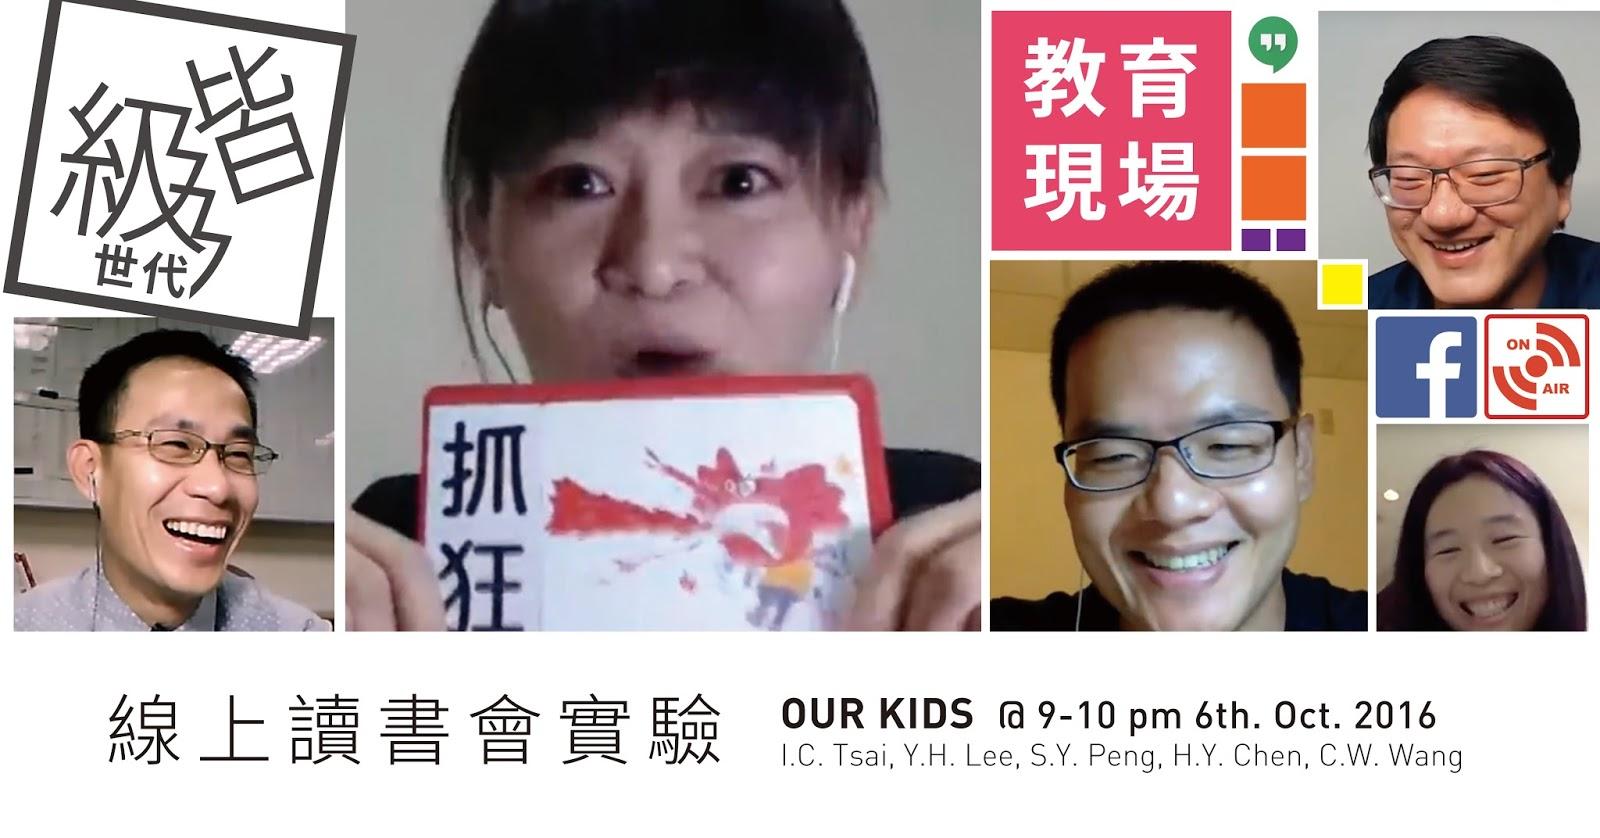 C.W.Wang. MD   王姿文: 線上讀書會直播 -- 階級世代X教育現場